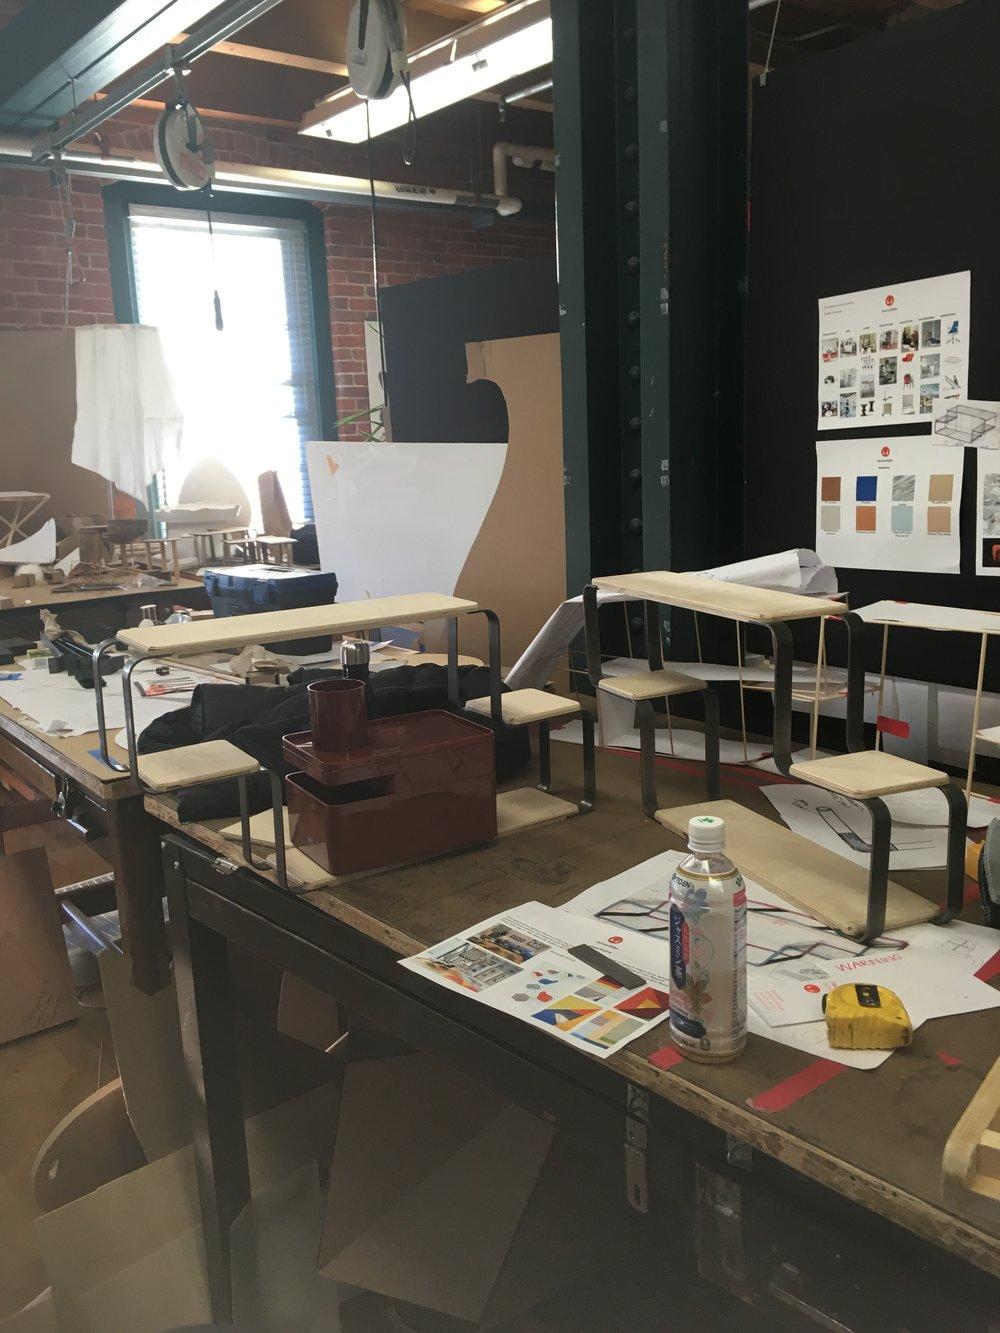 Testing how Mondri shelf interacts with Herman Miller's Formwork desk organizers.